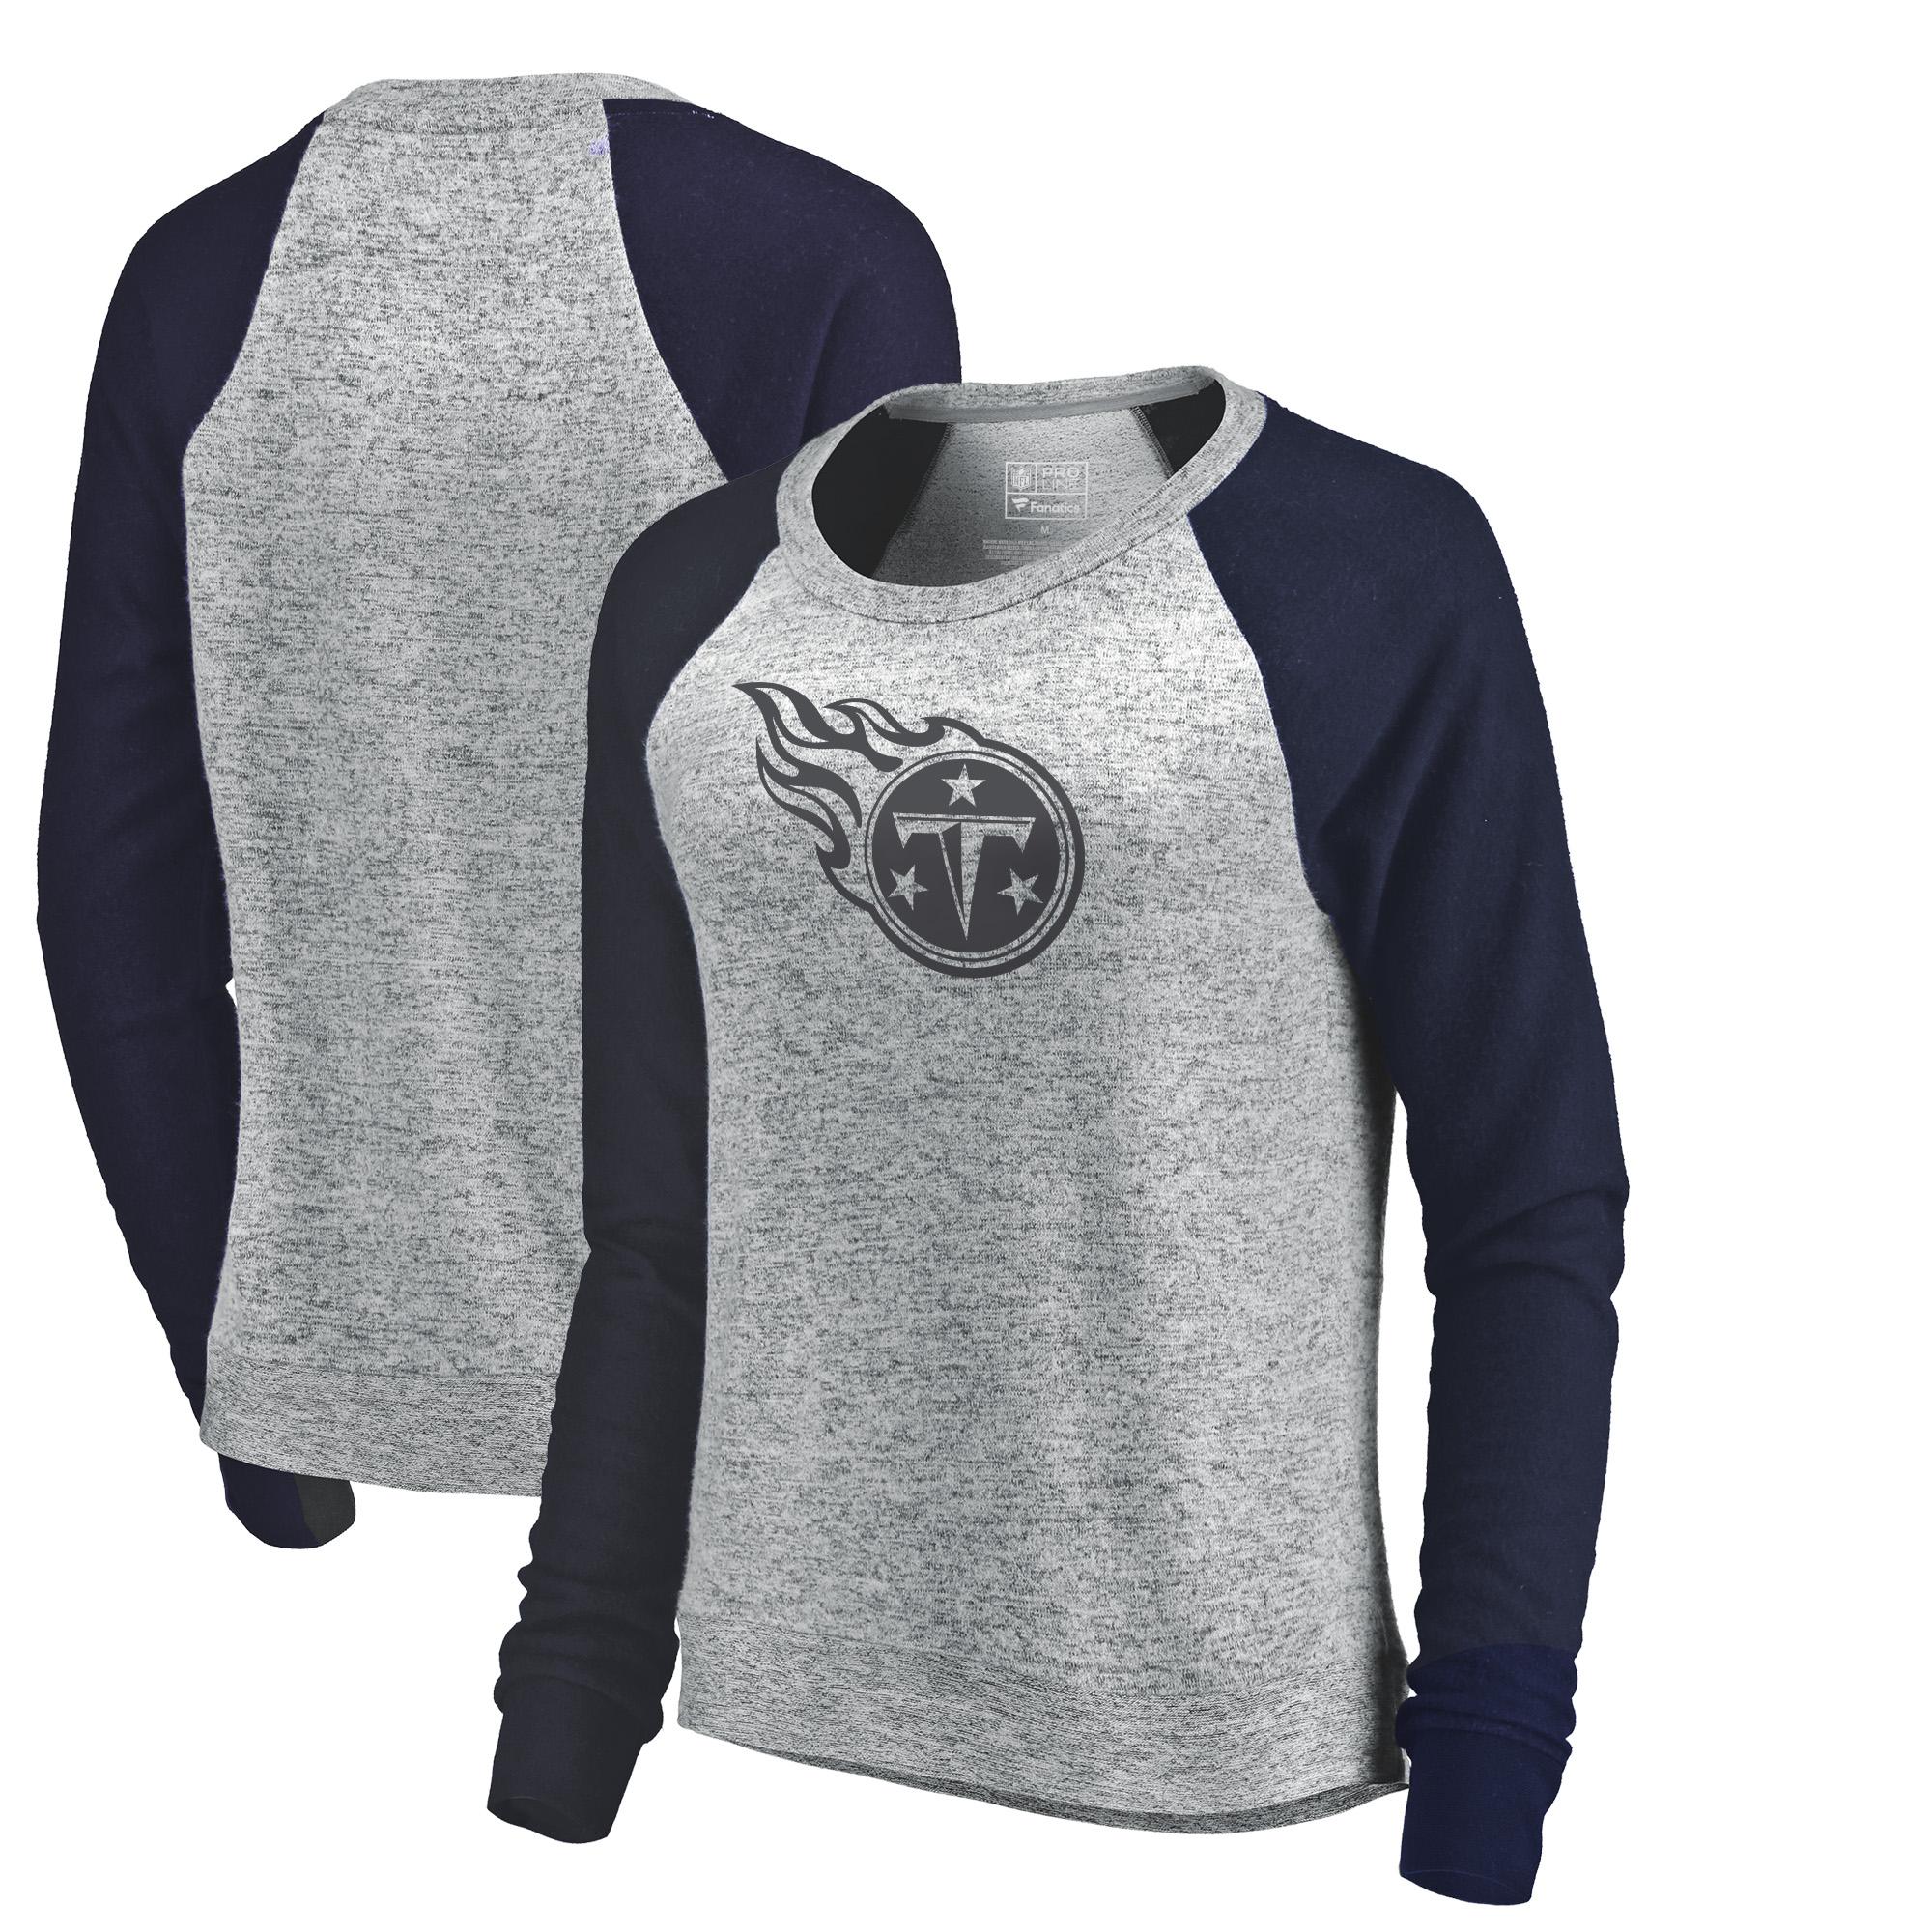 Tennessee Titans NFL Pro Line by Fanatics Branded Women's Cozy Collection Plush Crew Sweatshirt - Ash